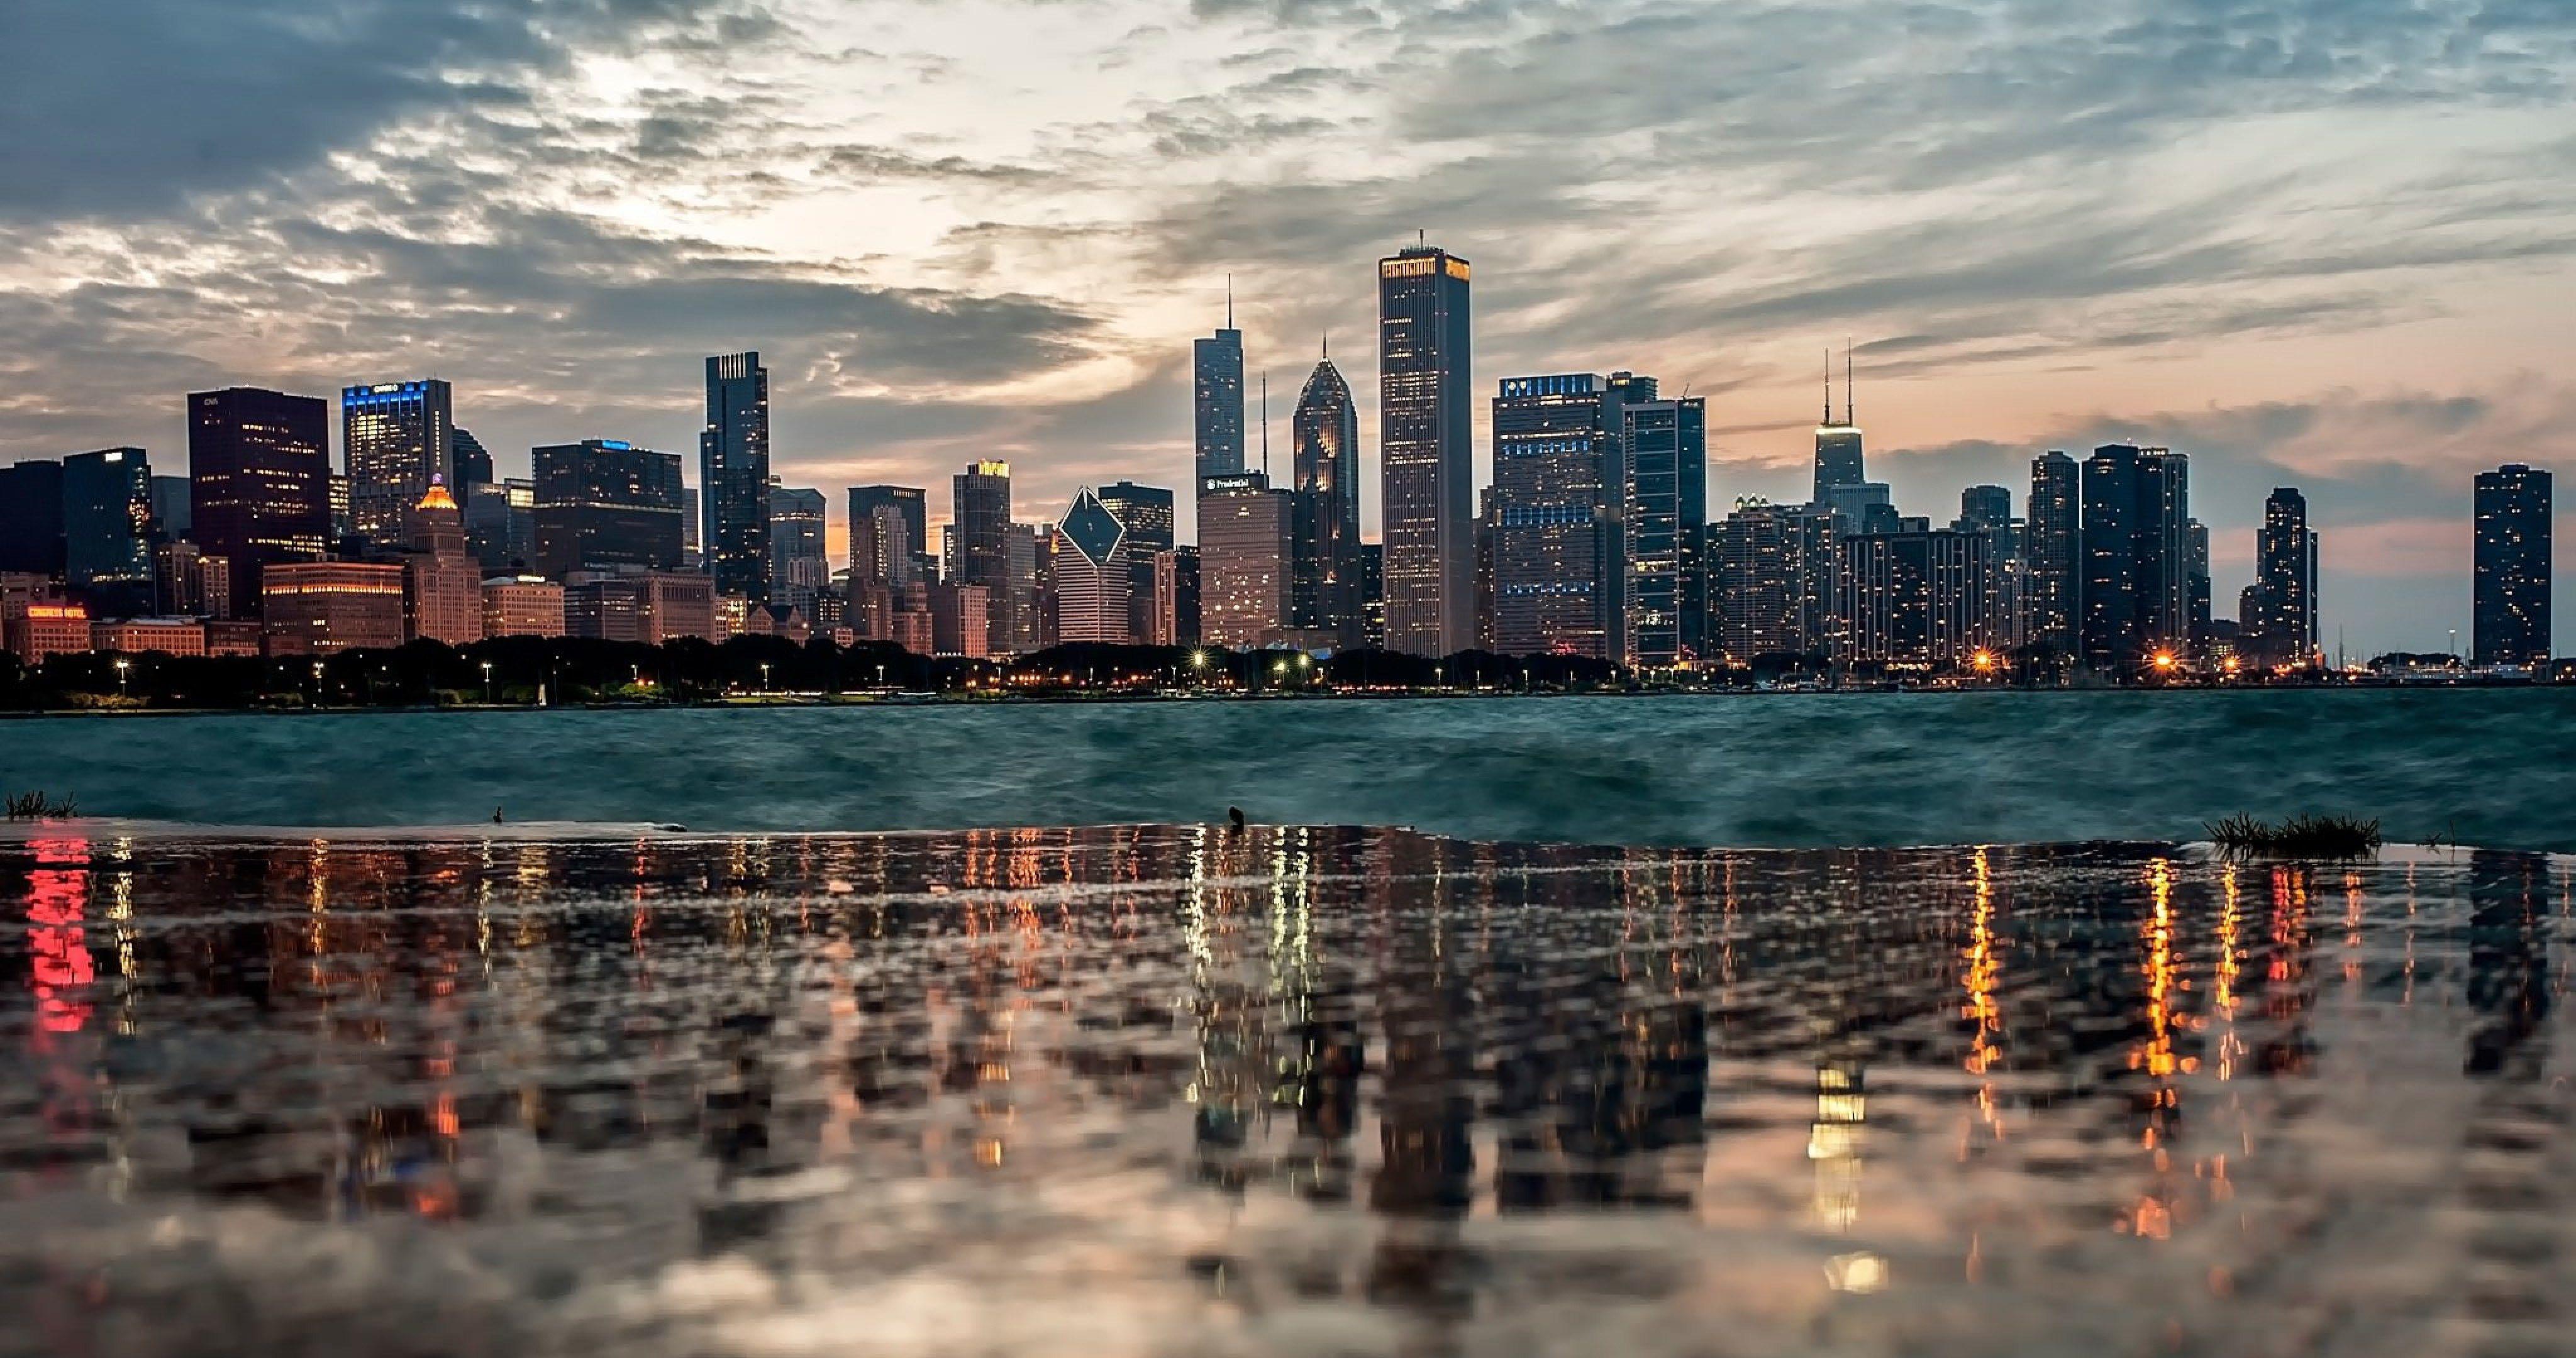 chicago reflection 4k ultra hd wallpaper